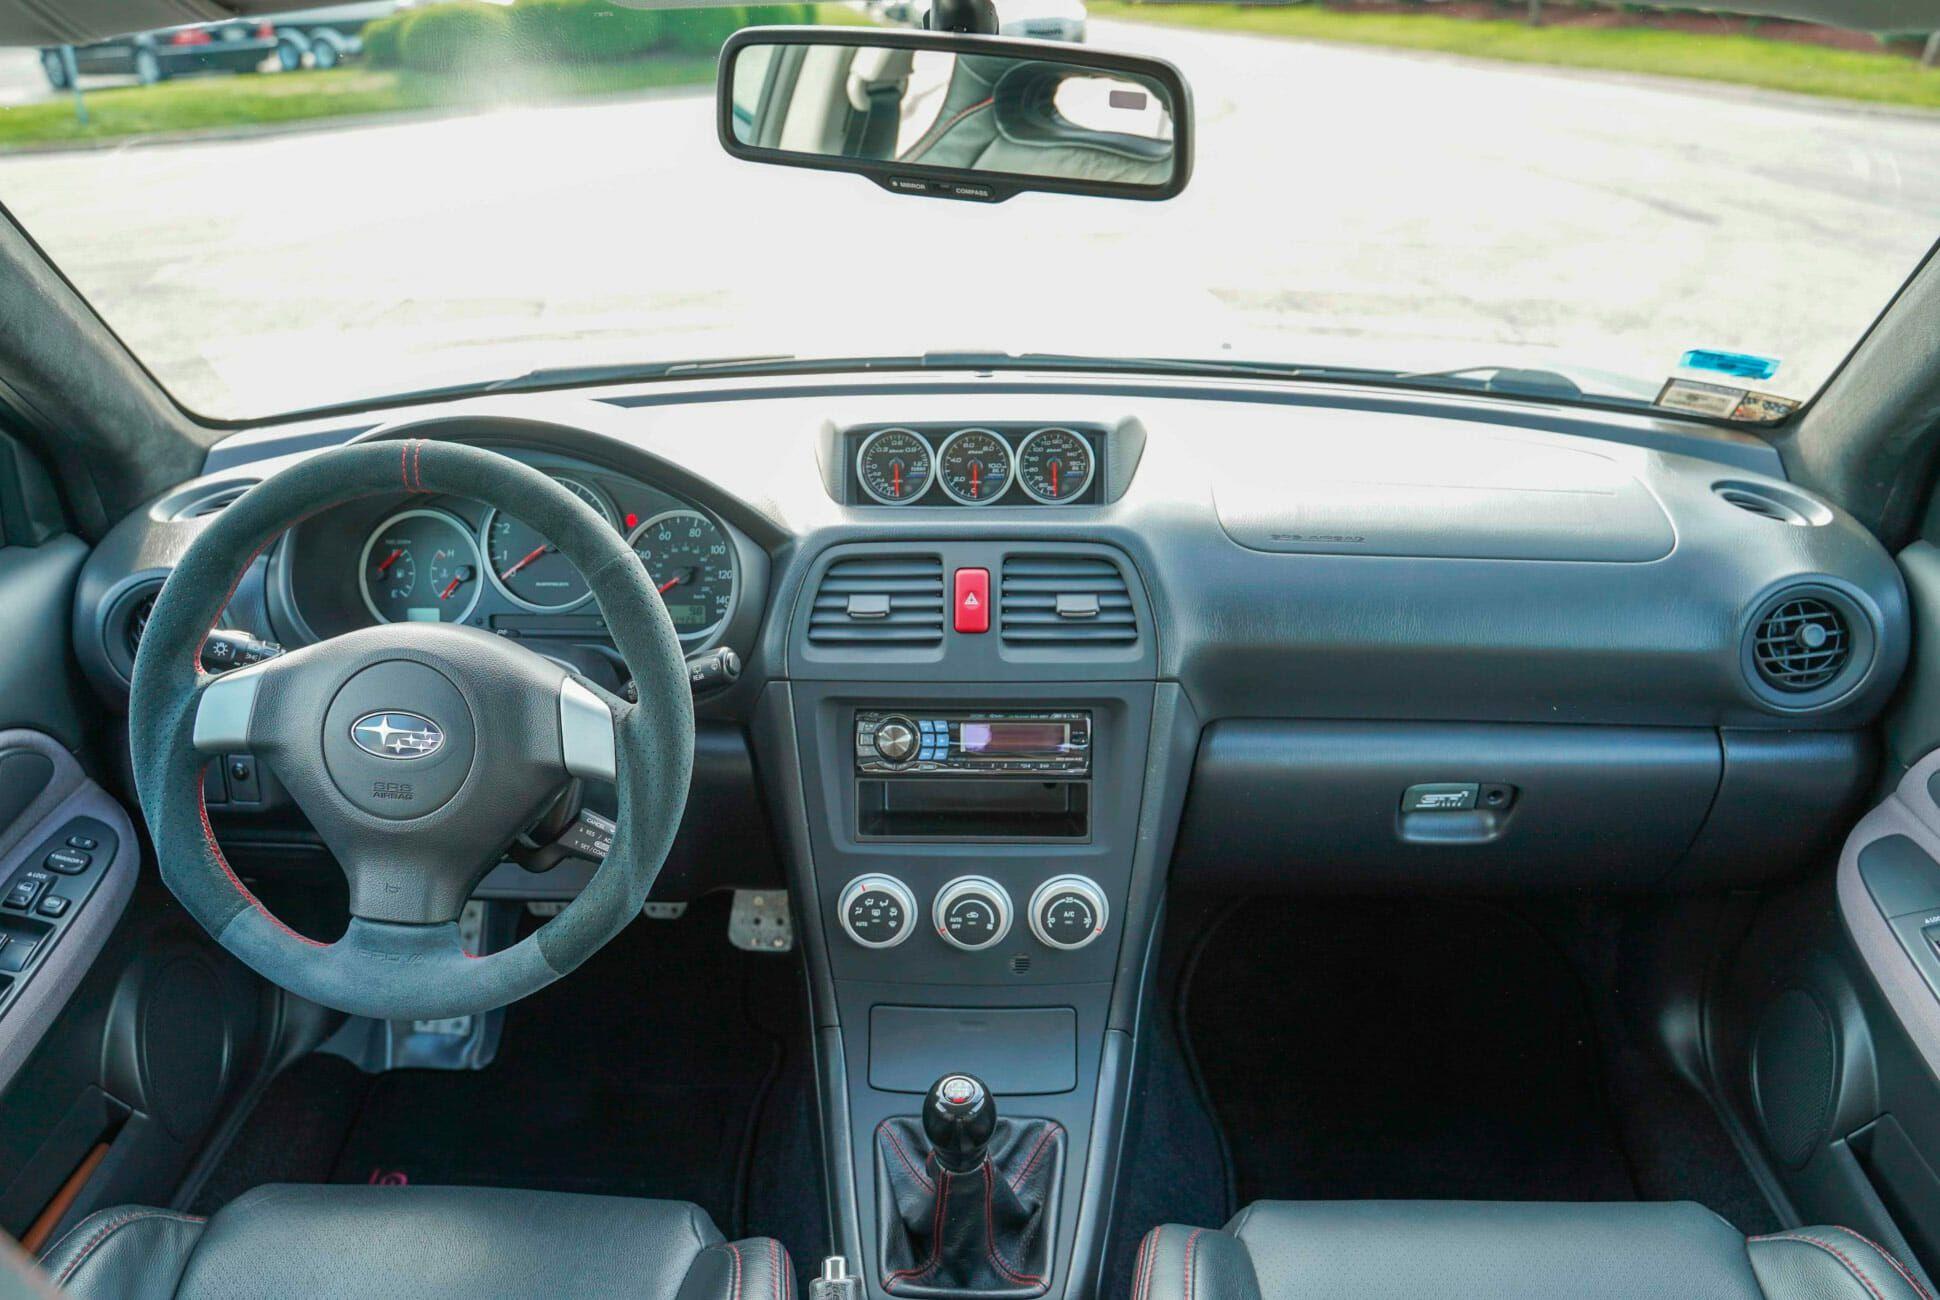 2007-Subaru-WRX-Wagon-14K-Miles-gear-patrol-slide-7